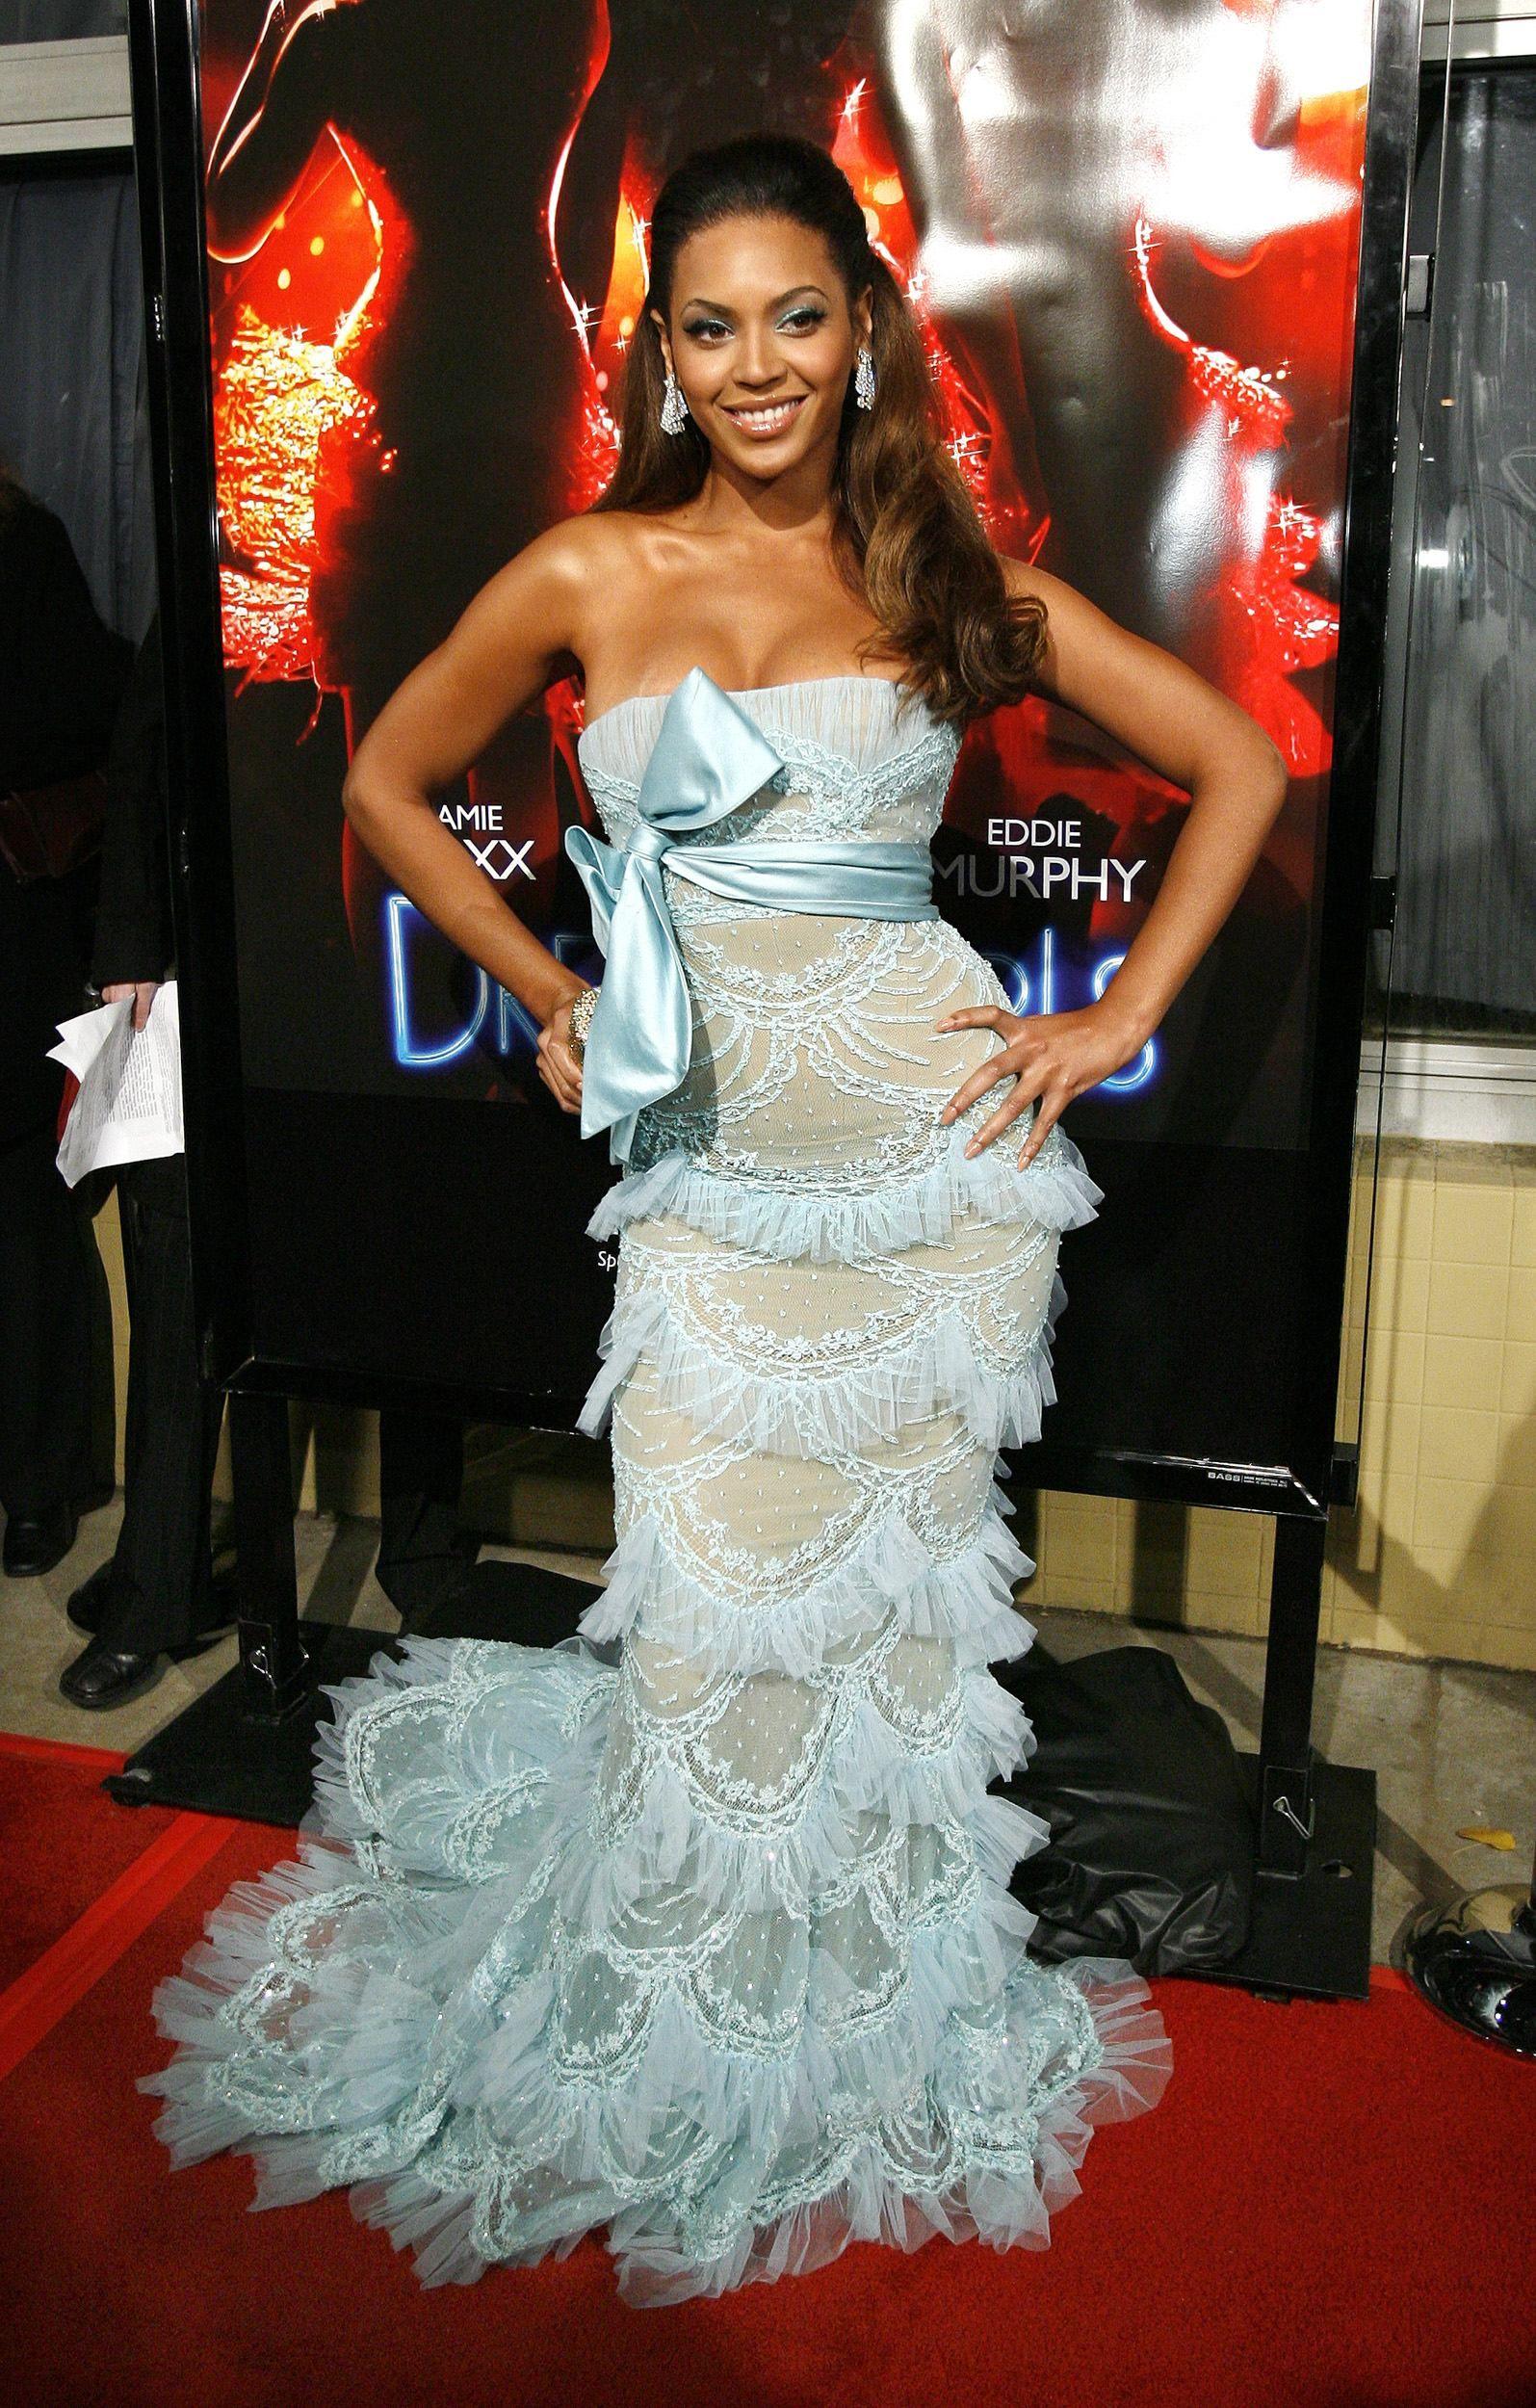 evening blue dress beyonce | DRESSED TO KILL! | Pinterest | Blue ...